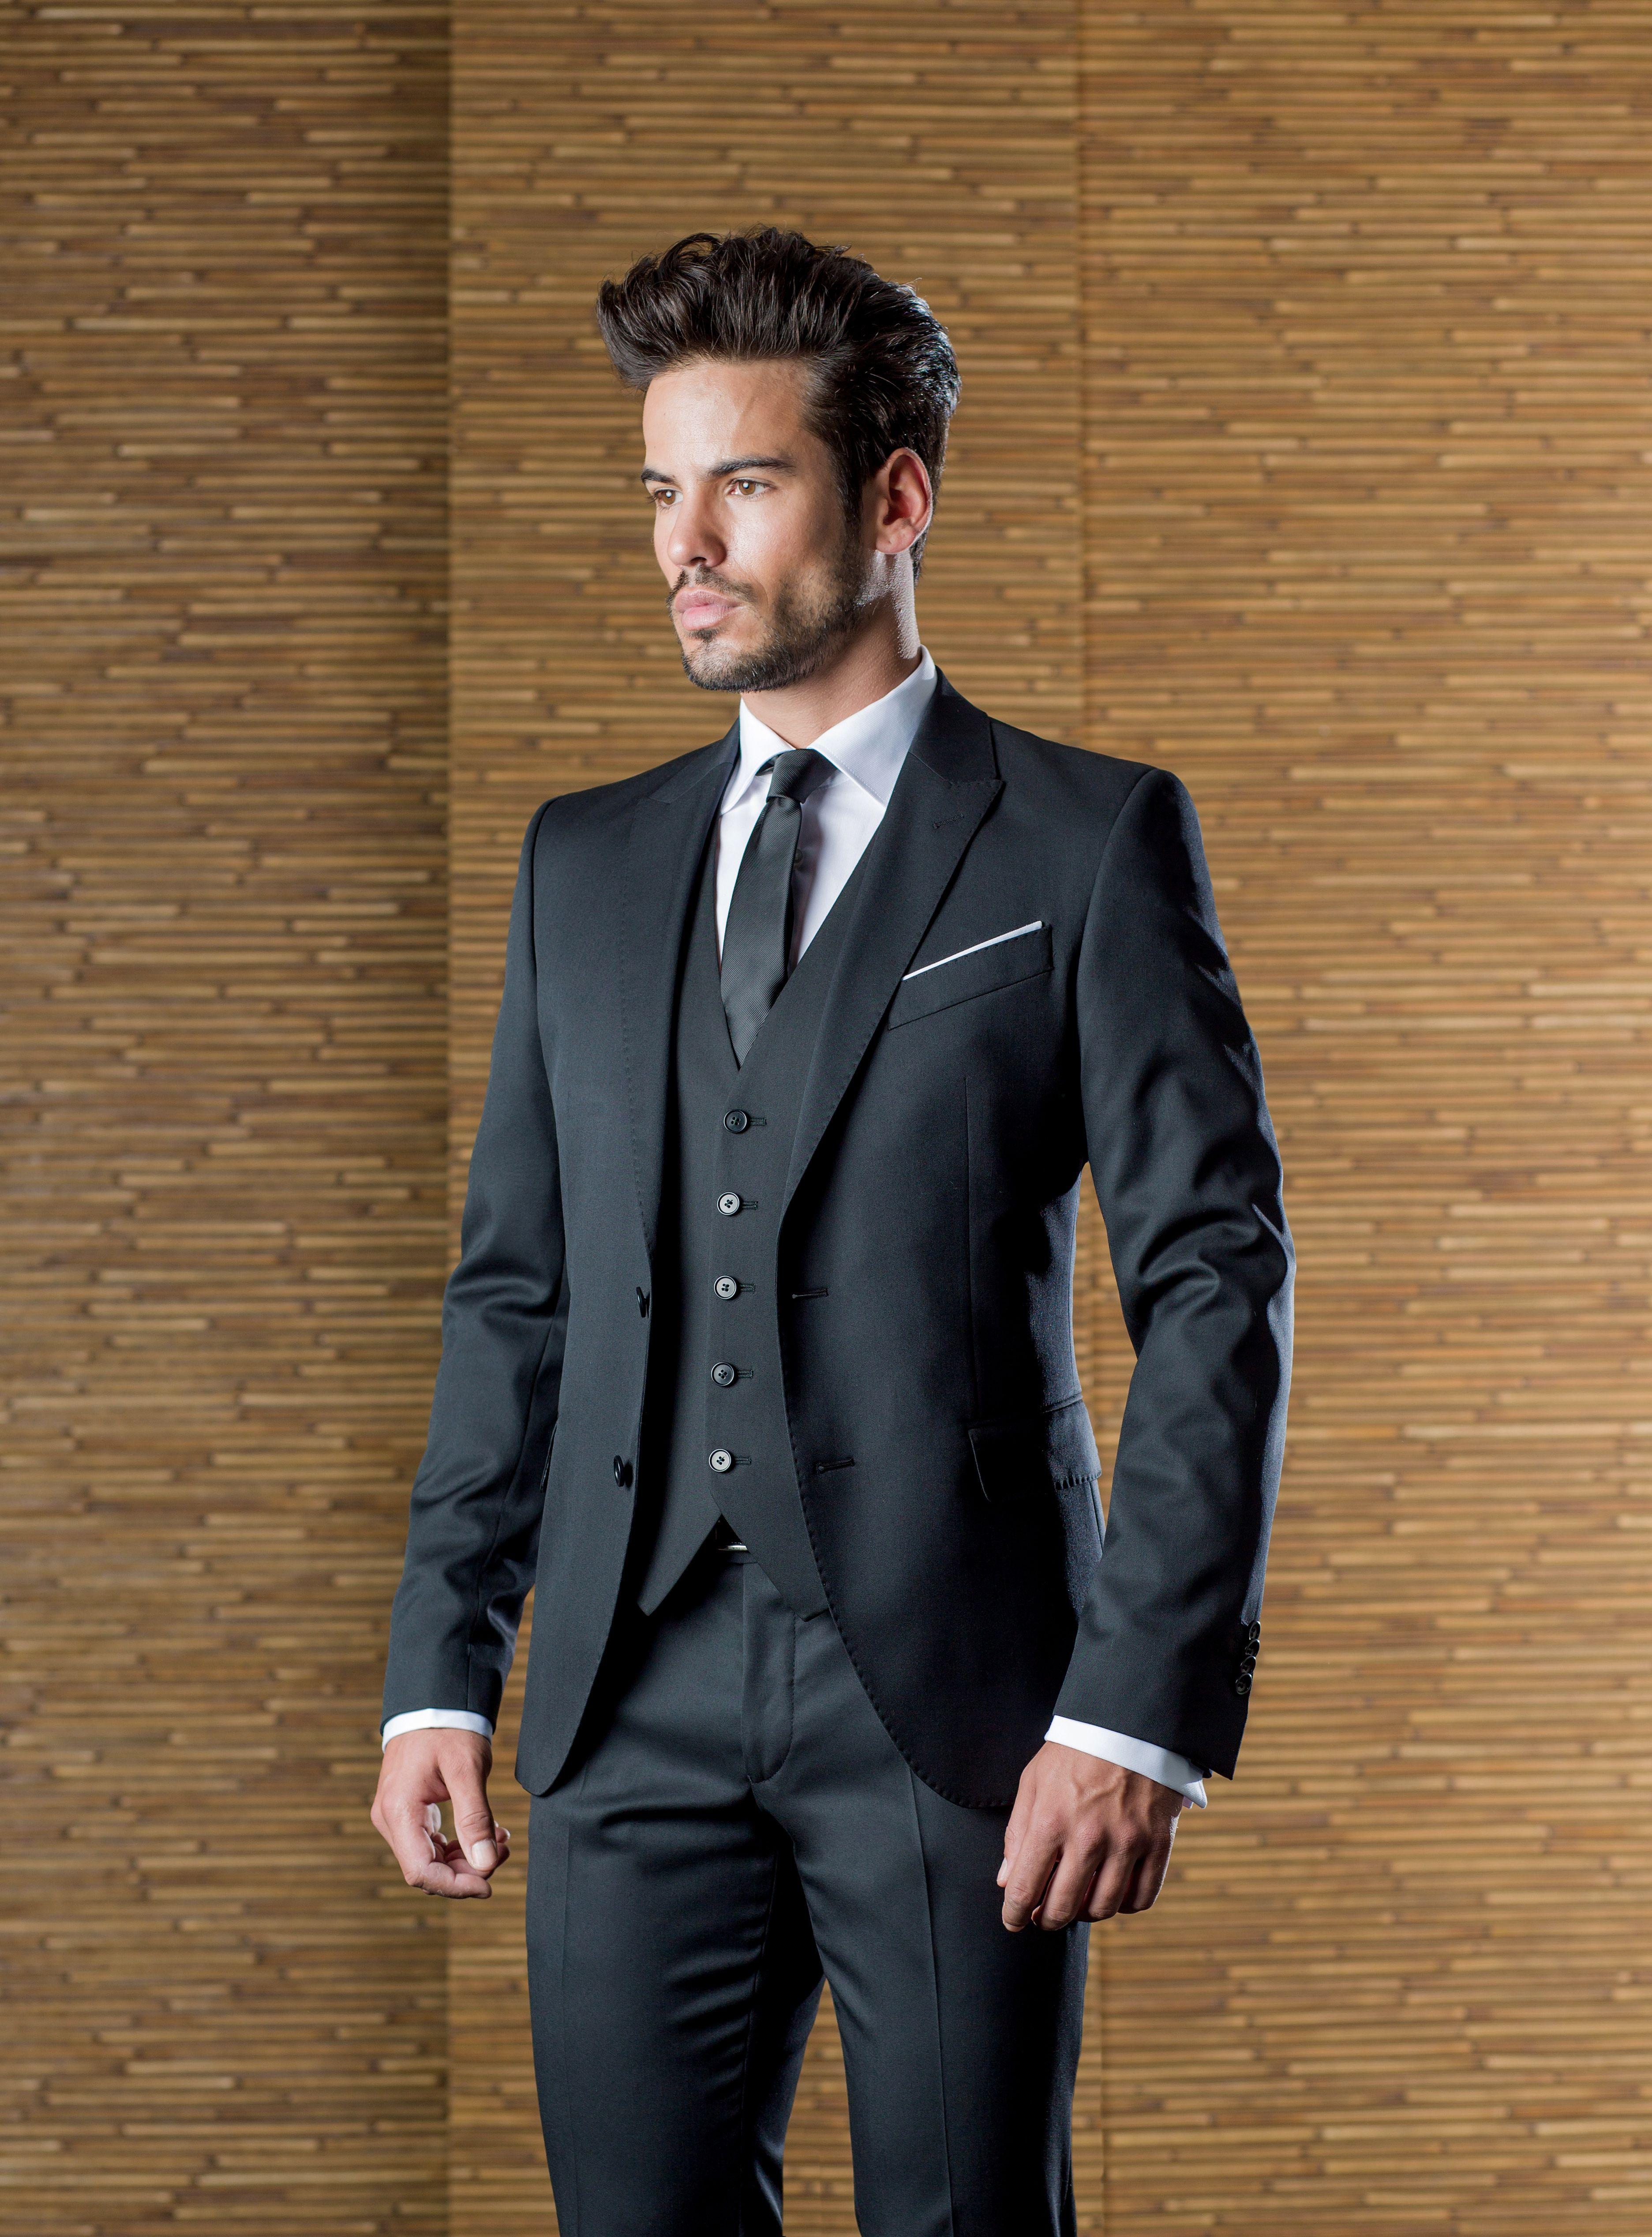 fa1d71c090818 Traje de boda con chaleco para padrino de la firma ETIEM